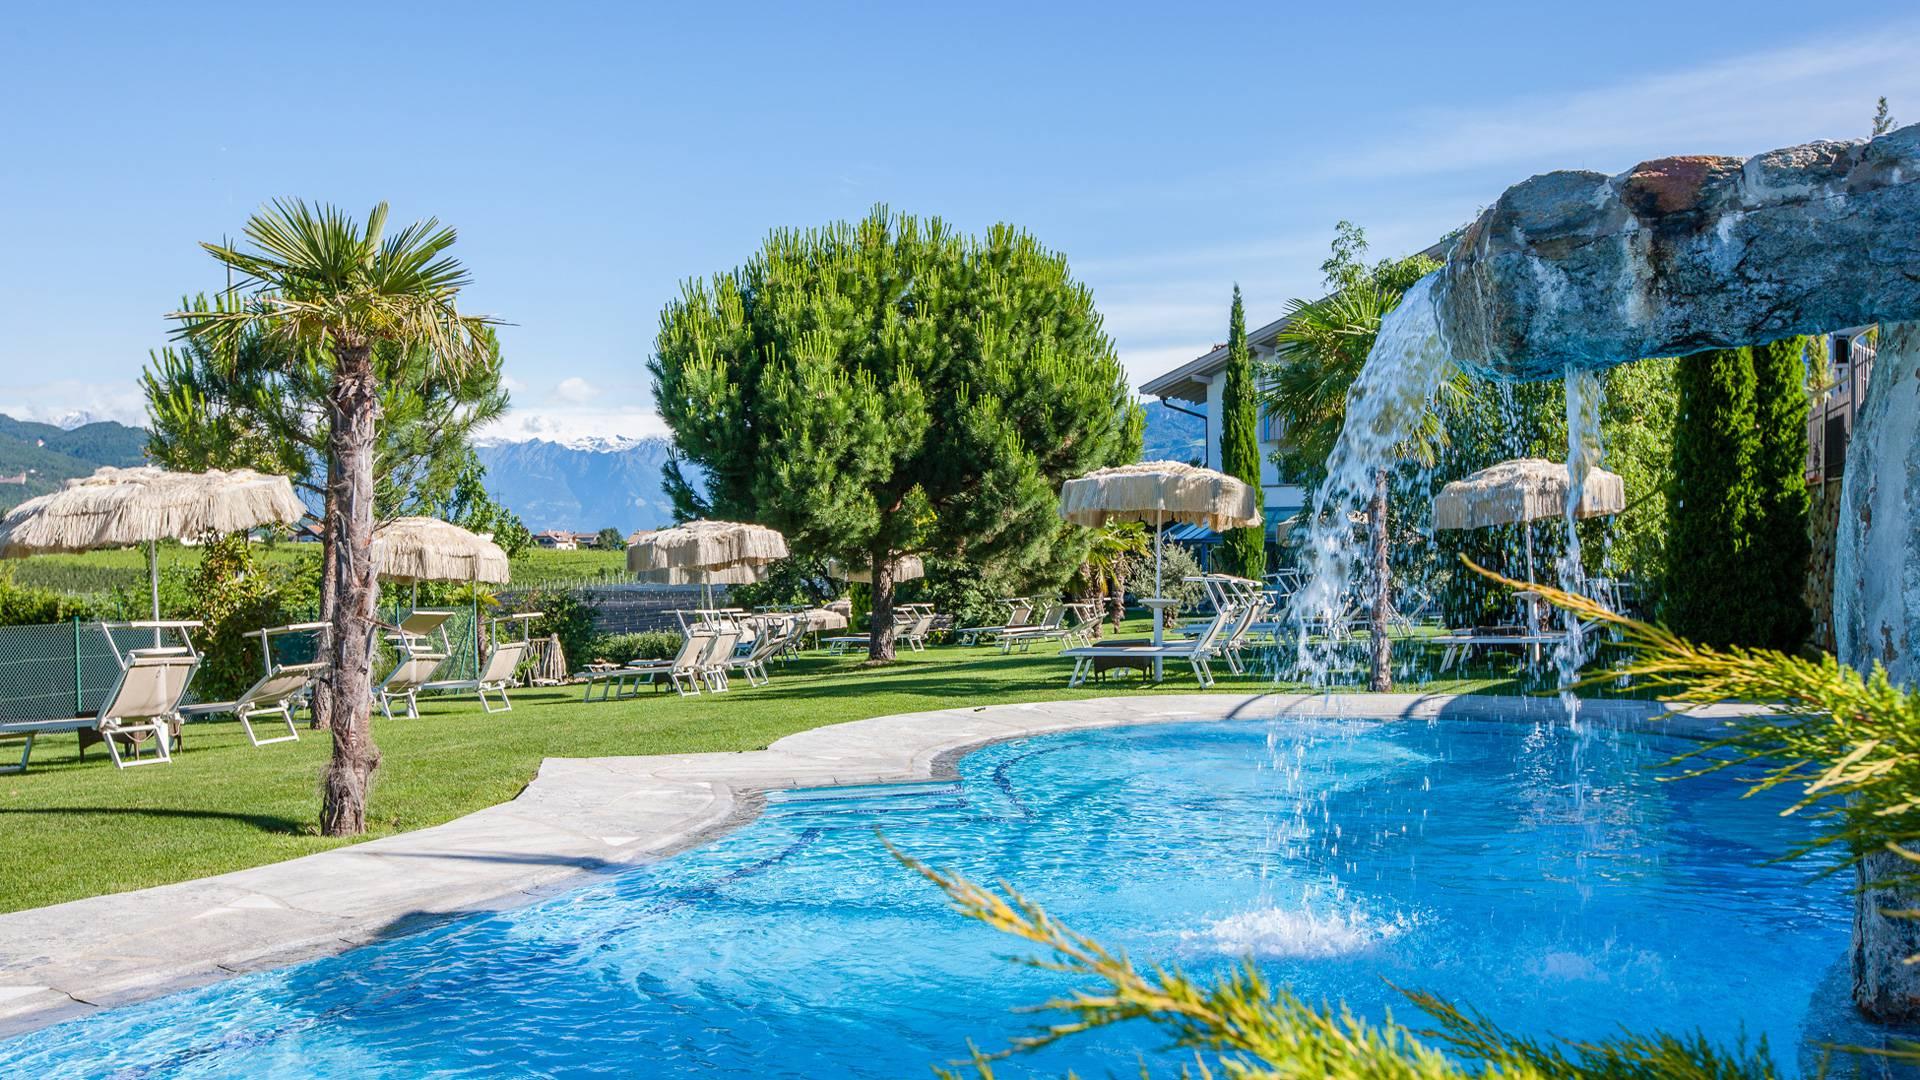 Family Hotel Alto Adige Con Piscina